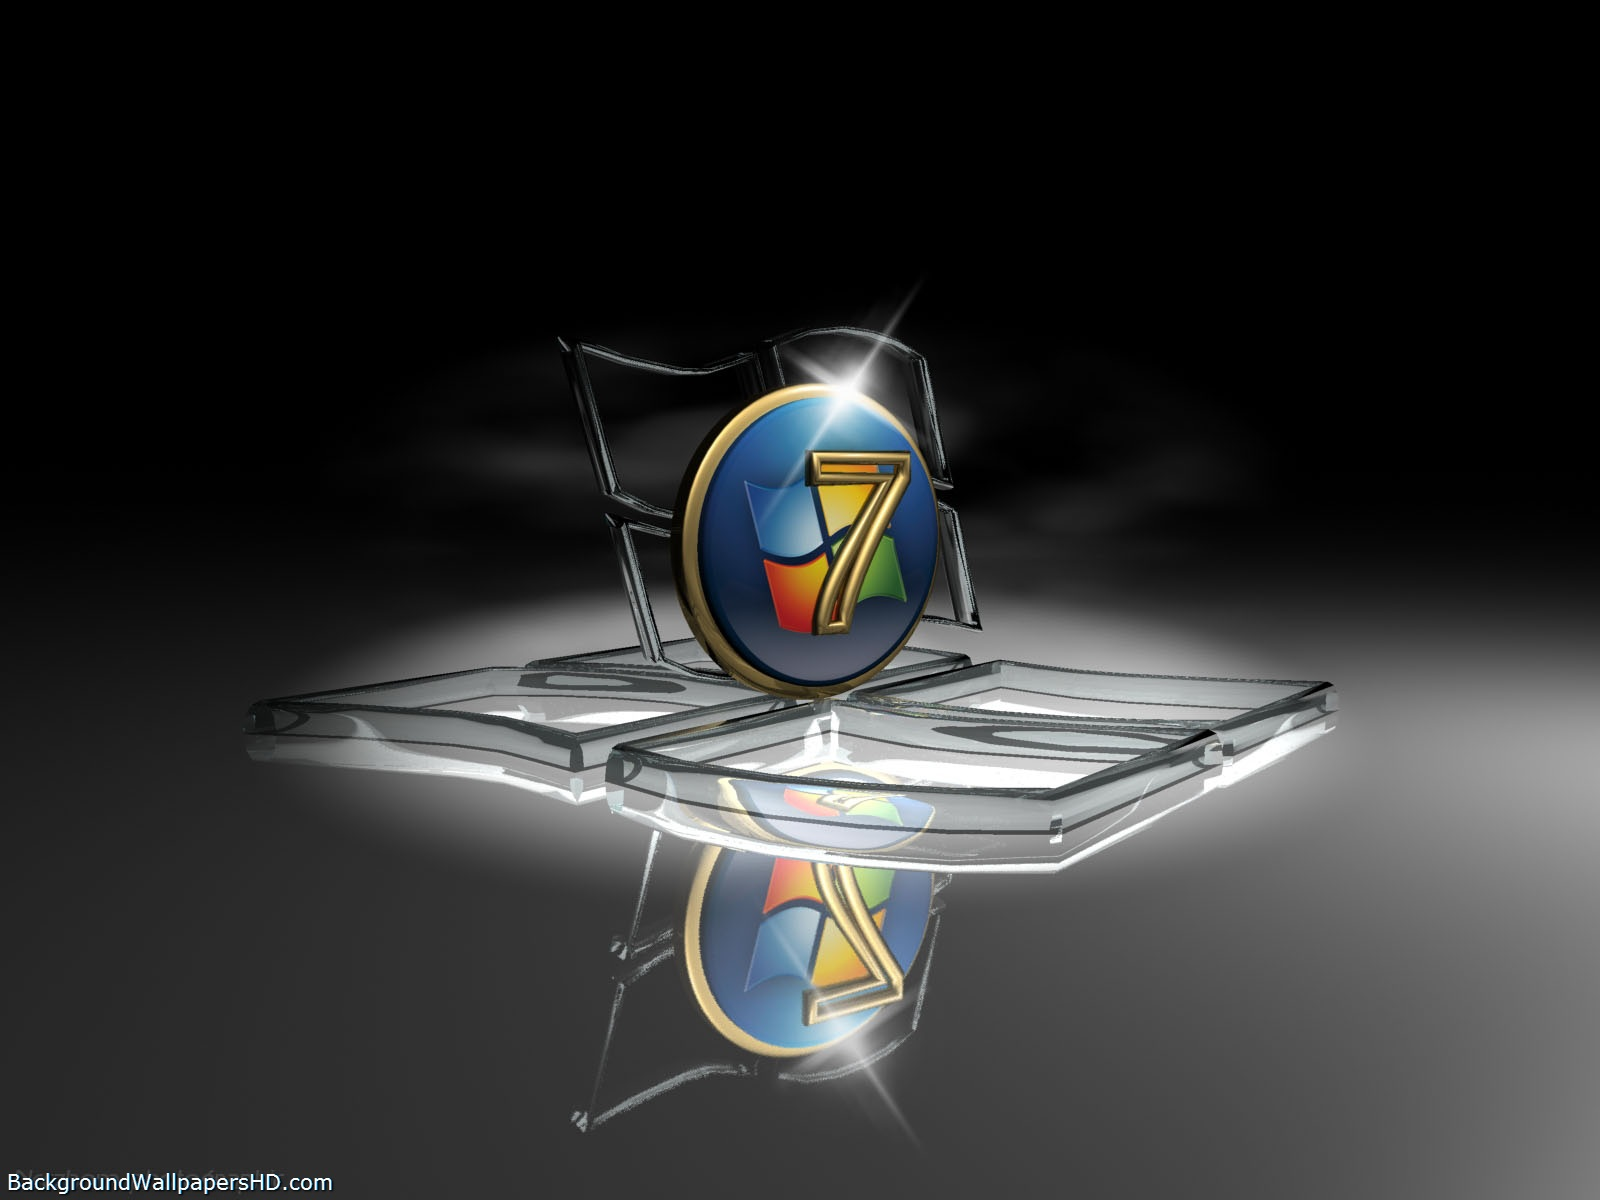 Windows 7 ultimate desktop background   SF Wallpaper 1600x1200